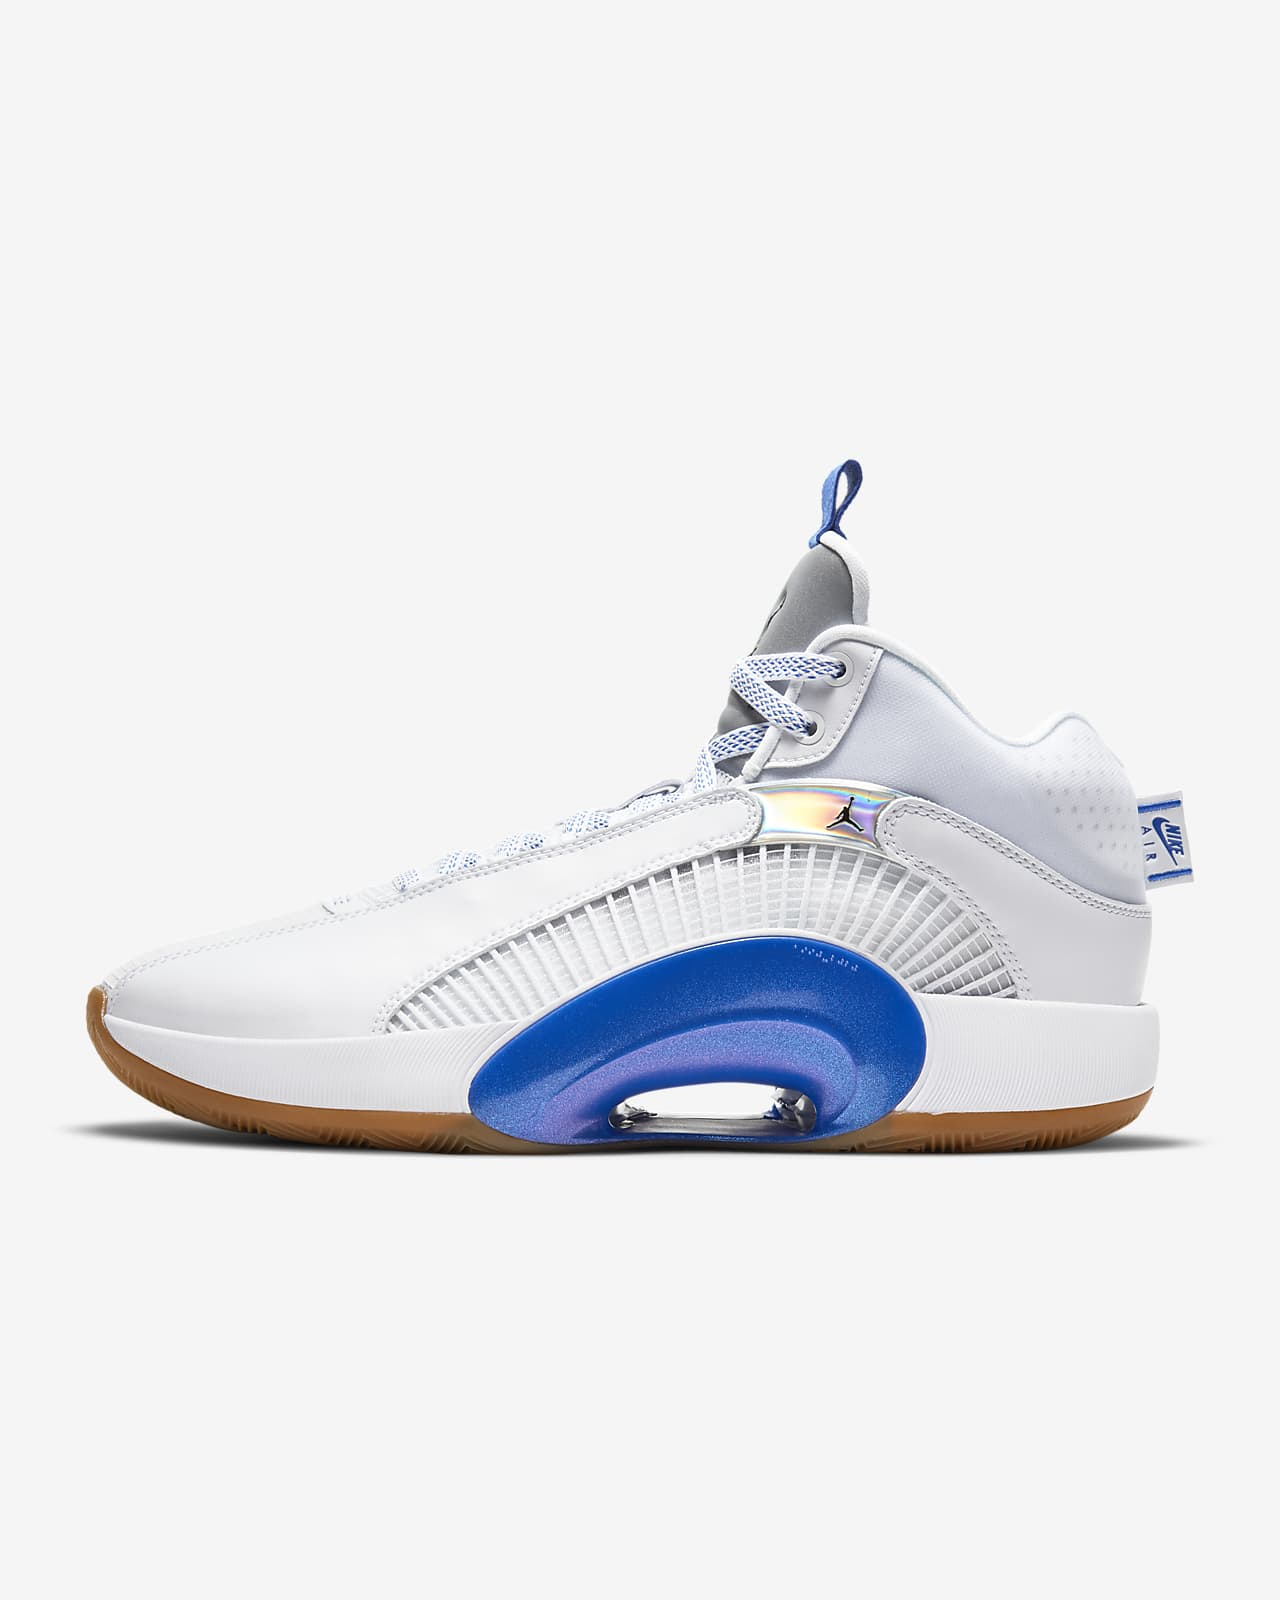 Air Jordan XXXV SH PF 男子篮球鞋